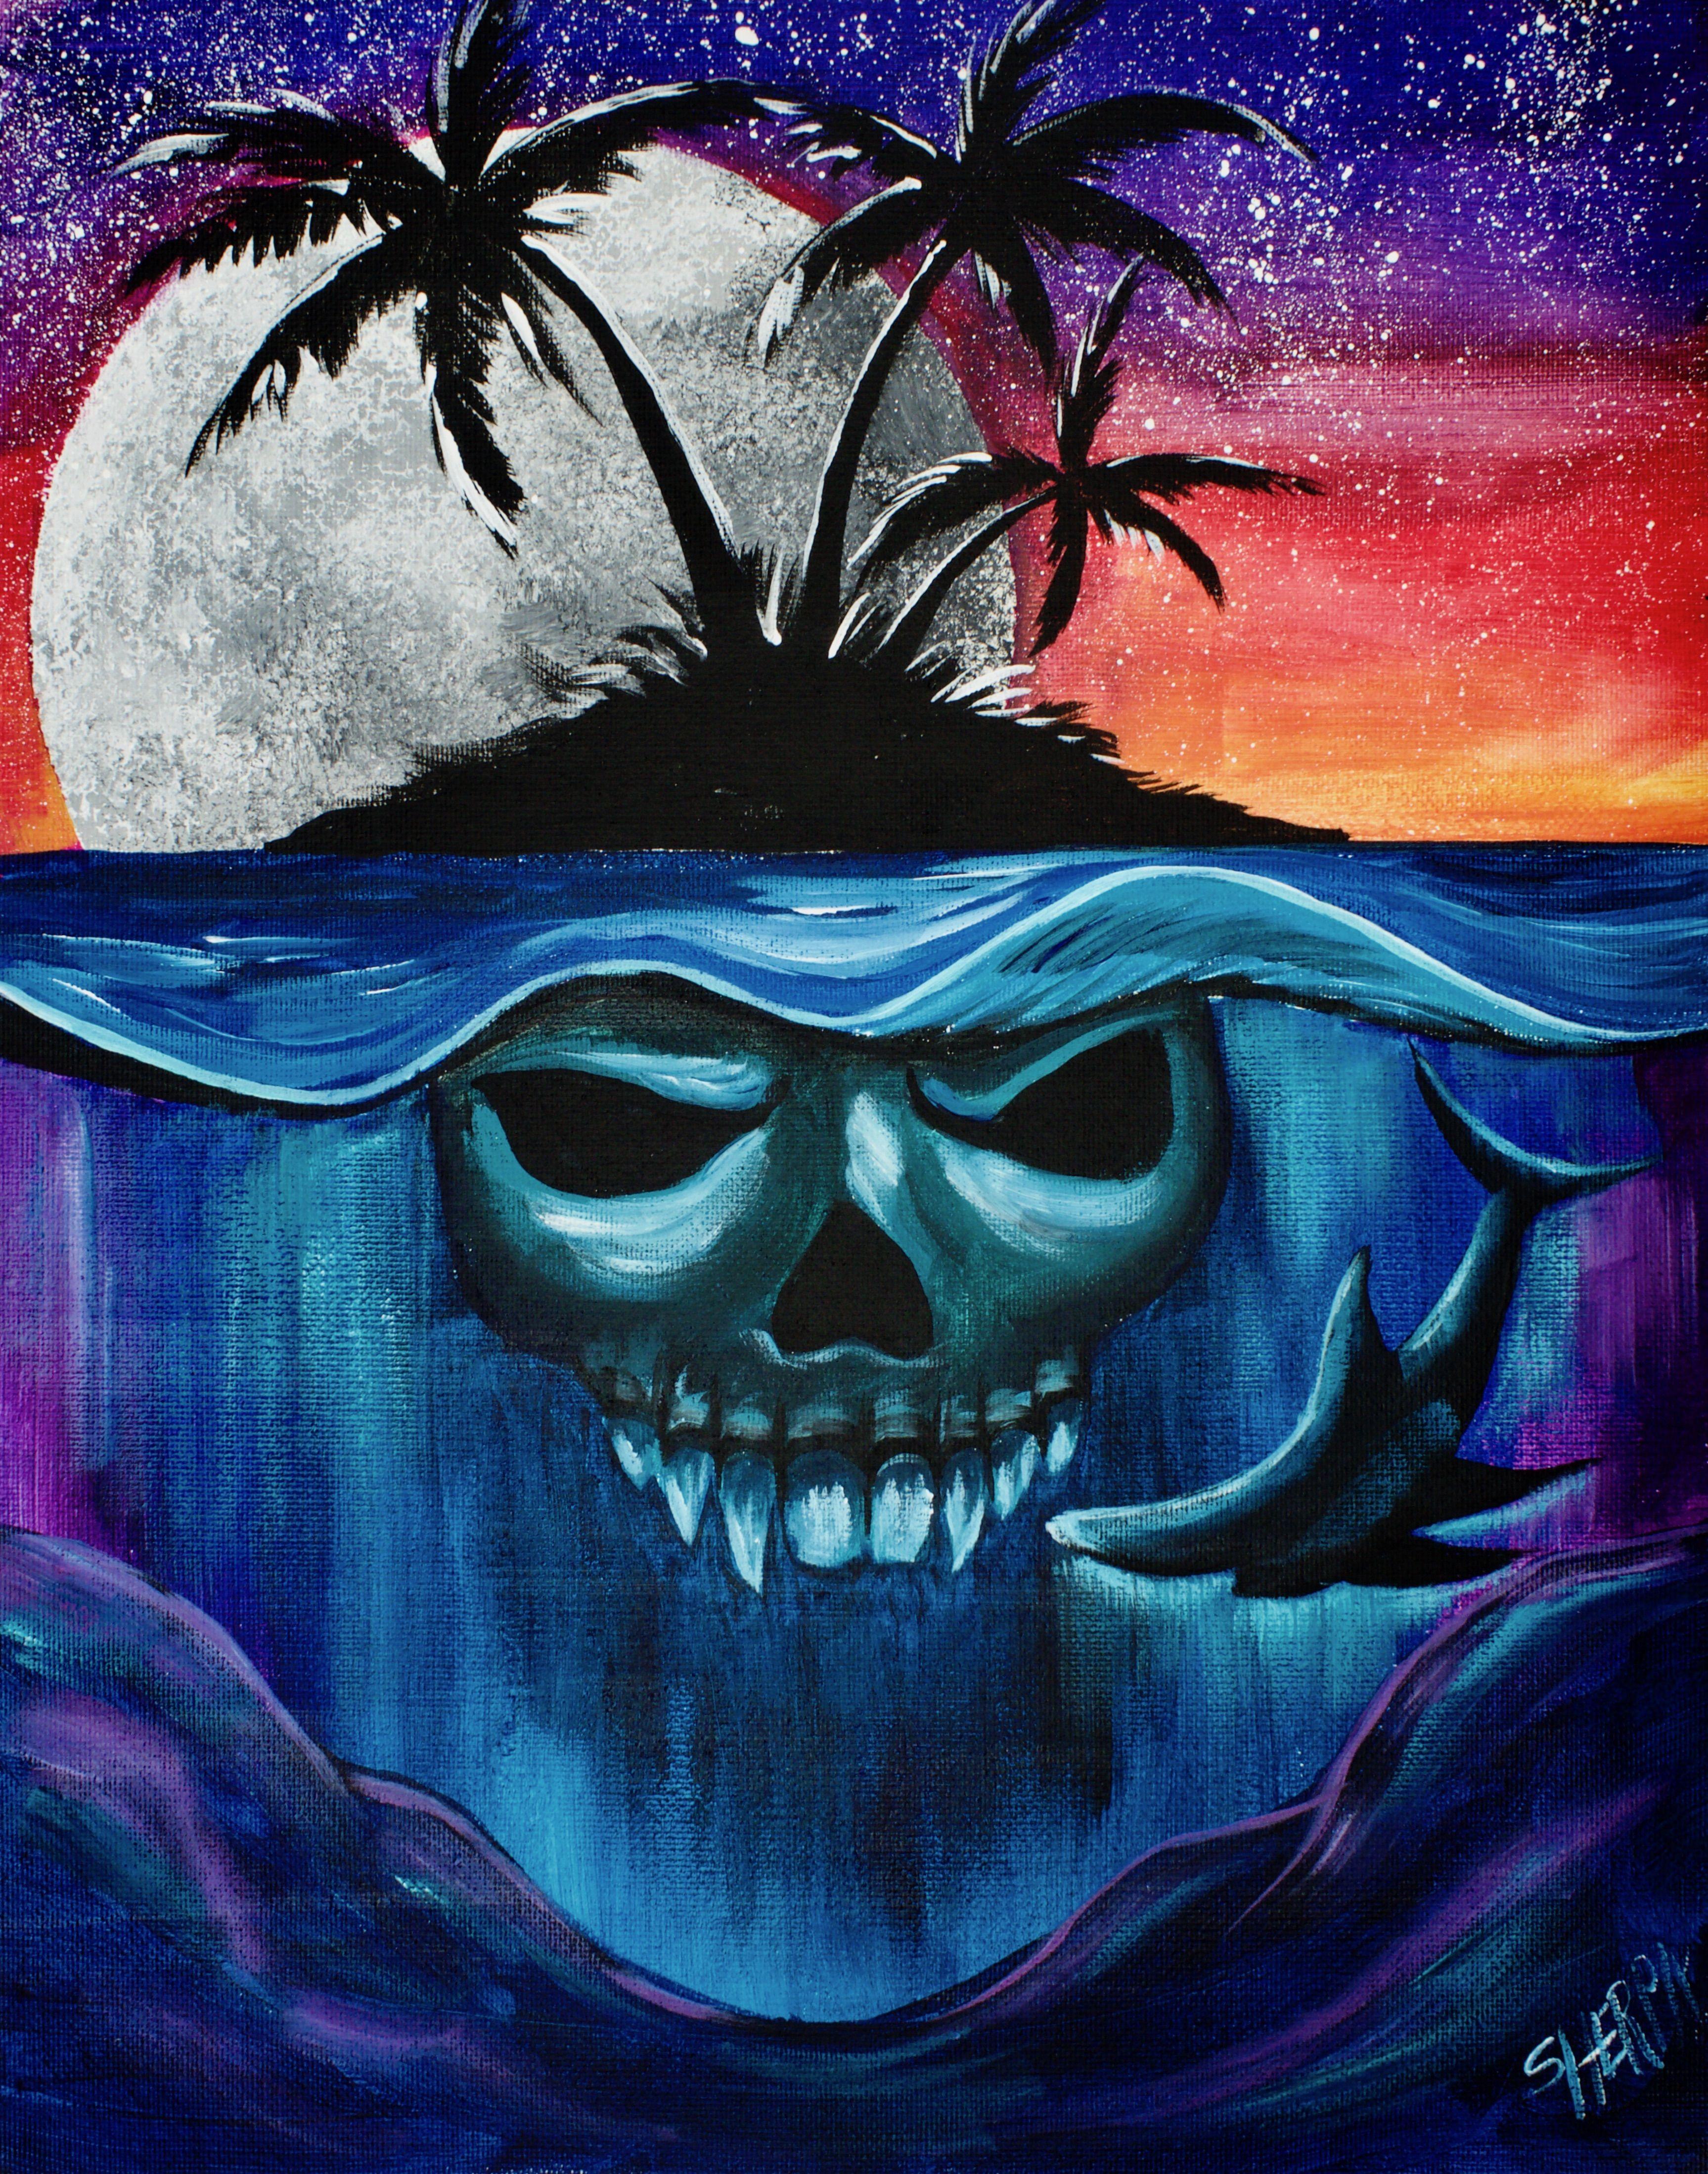 Design muse shark week - Mako Shark And Skull Island Step By Step Beginners Acrylic Painting Tutorial Sharkweek Sharkweek2017 Mako Art With Me In The Easy Acrylic Painting Lesson